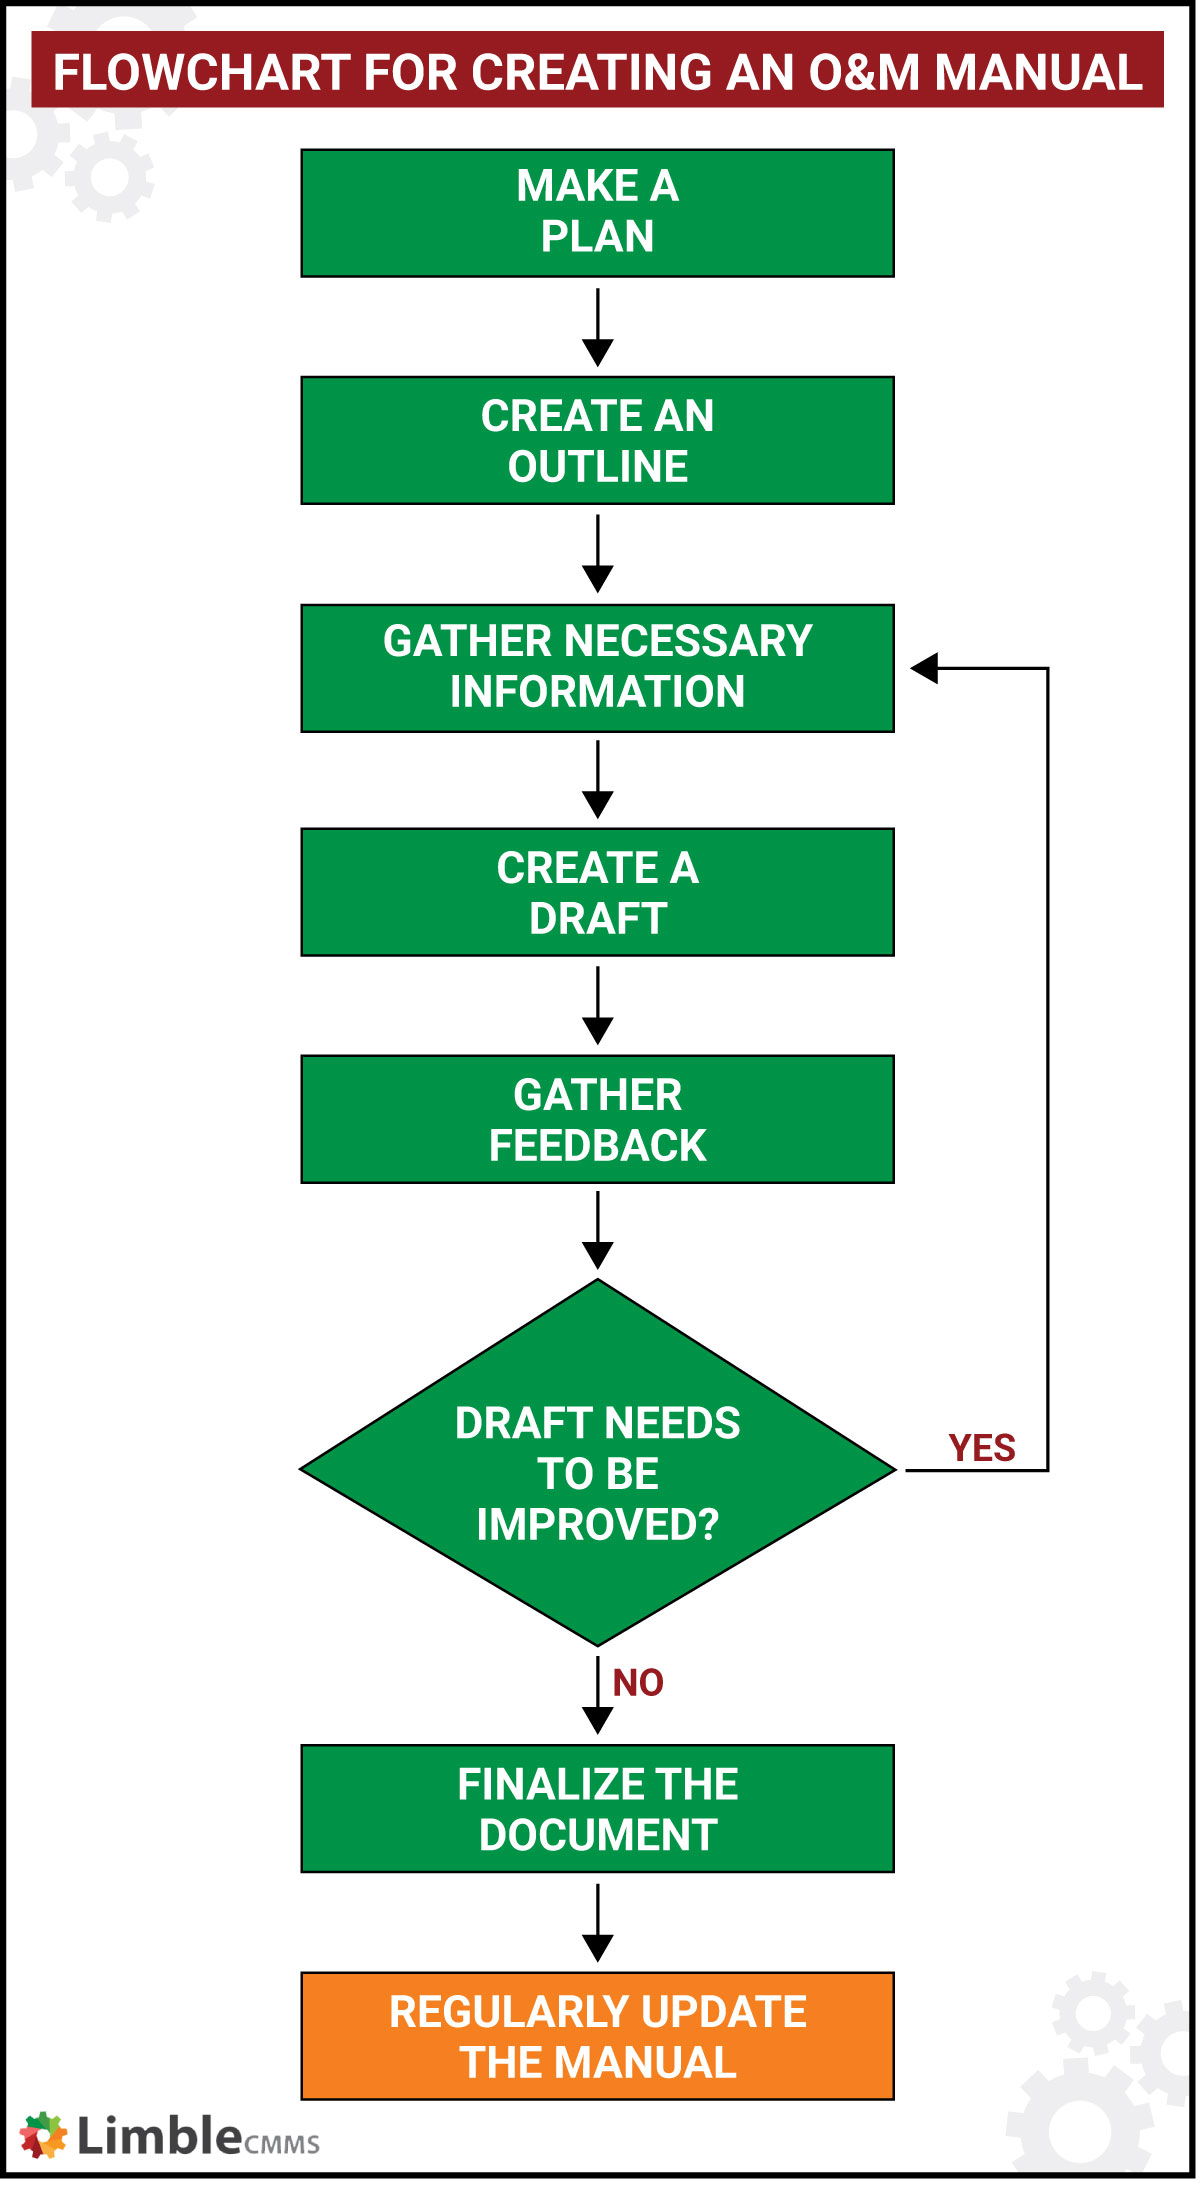 flowchart for creating an O&M manual